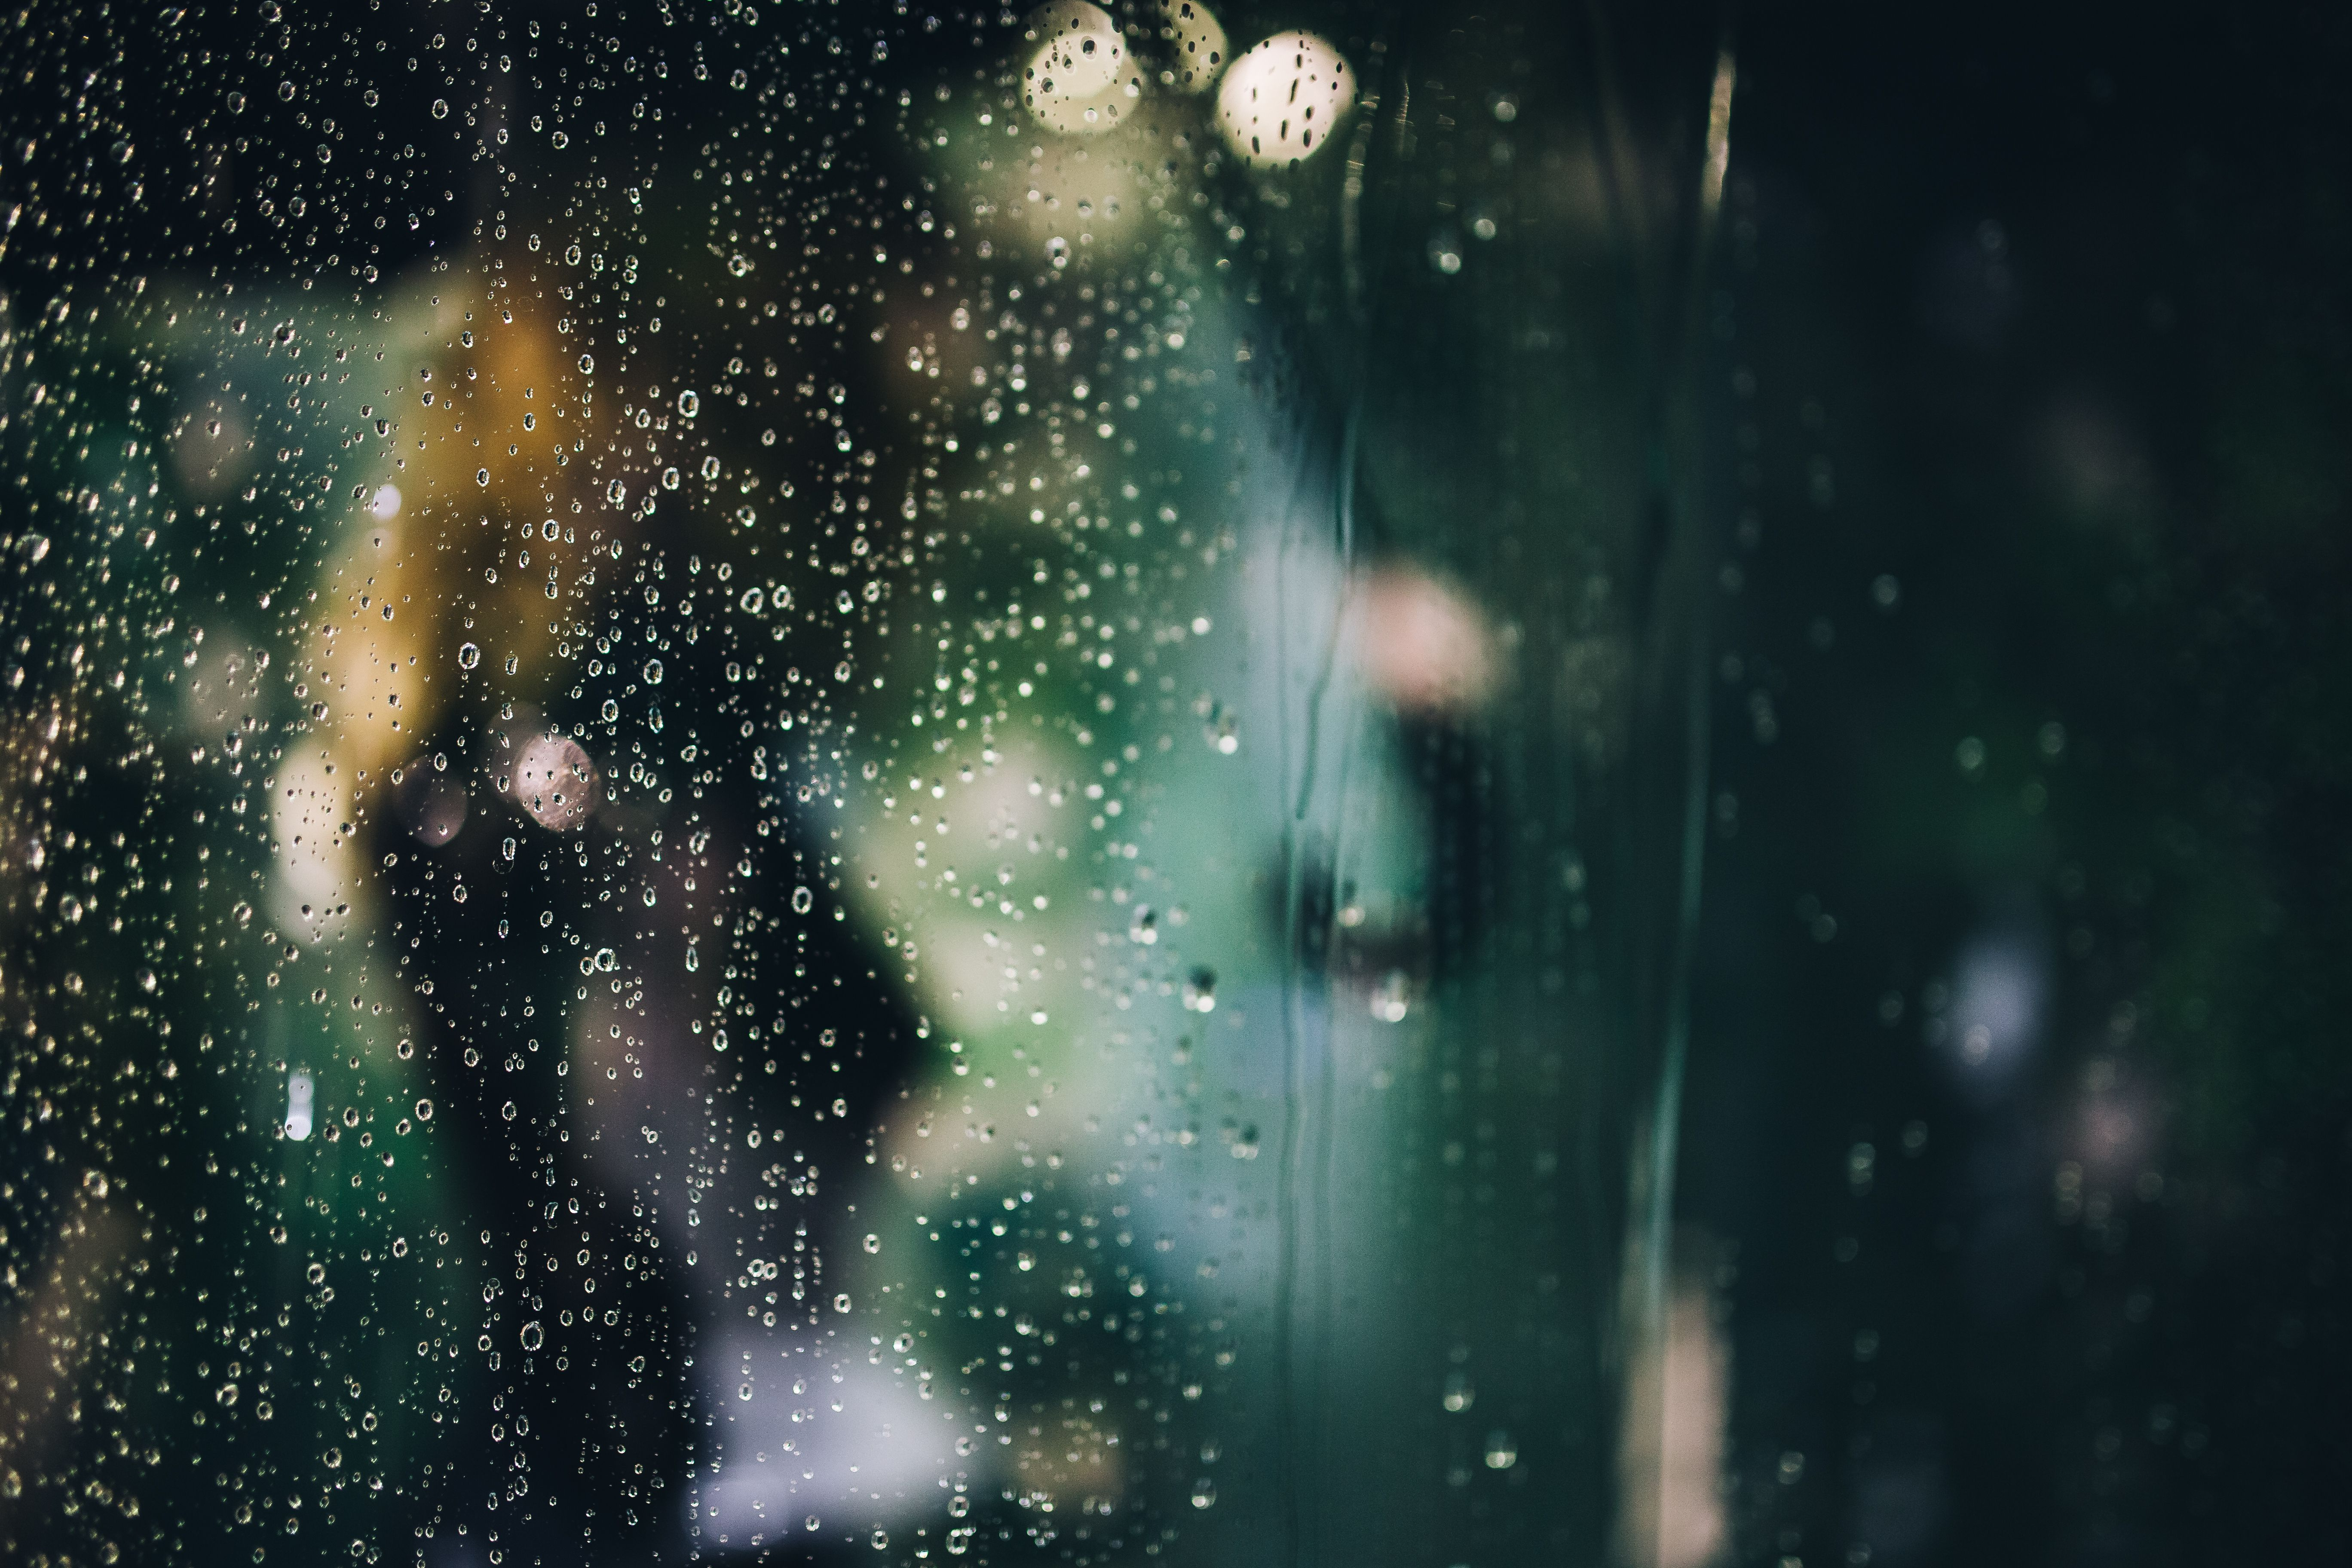 waterdrops rain